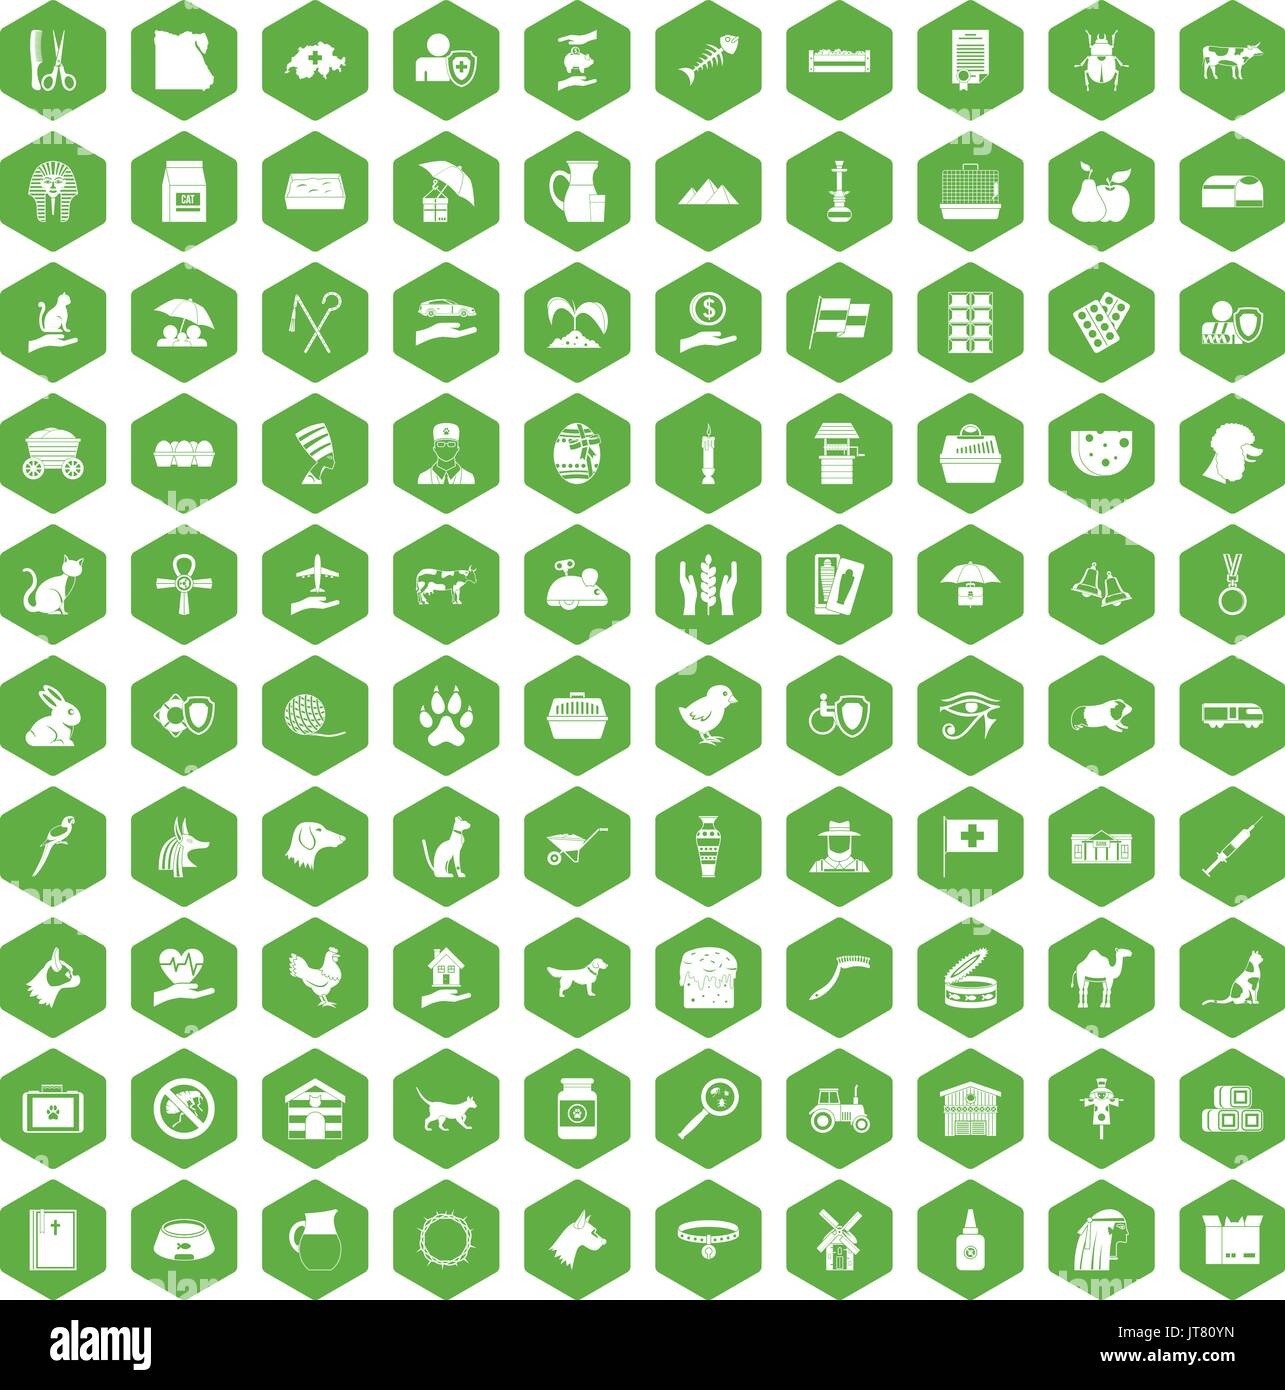 100 pets icons hexagon green - Stock Image